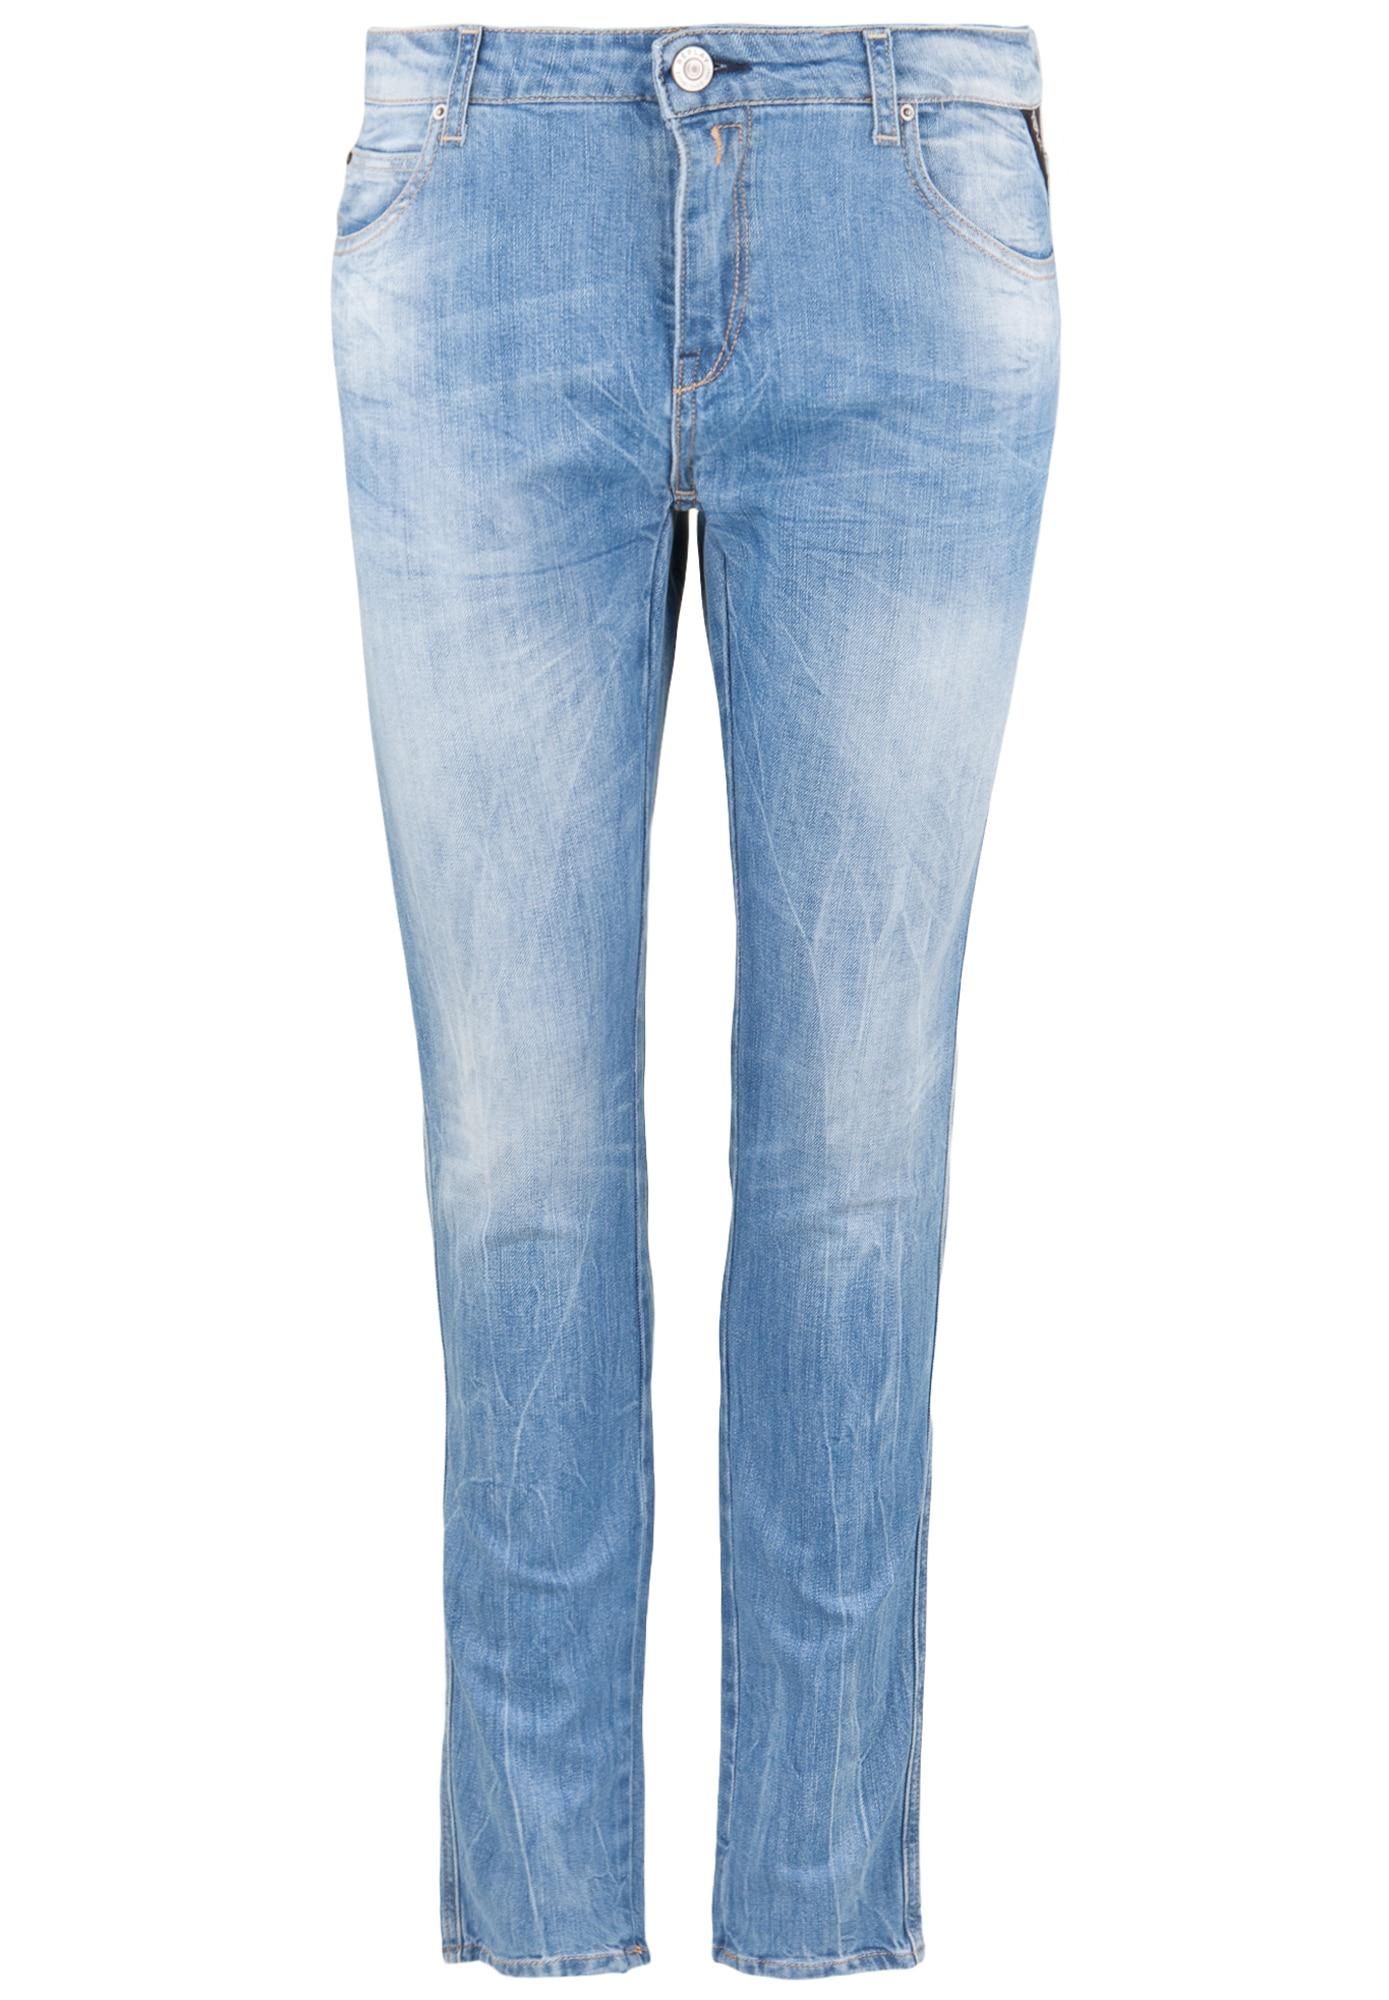 REPLAY Heren Jeans ANBASS COMFORT DENIM lichtblauw